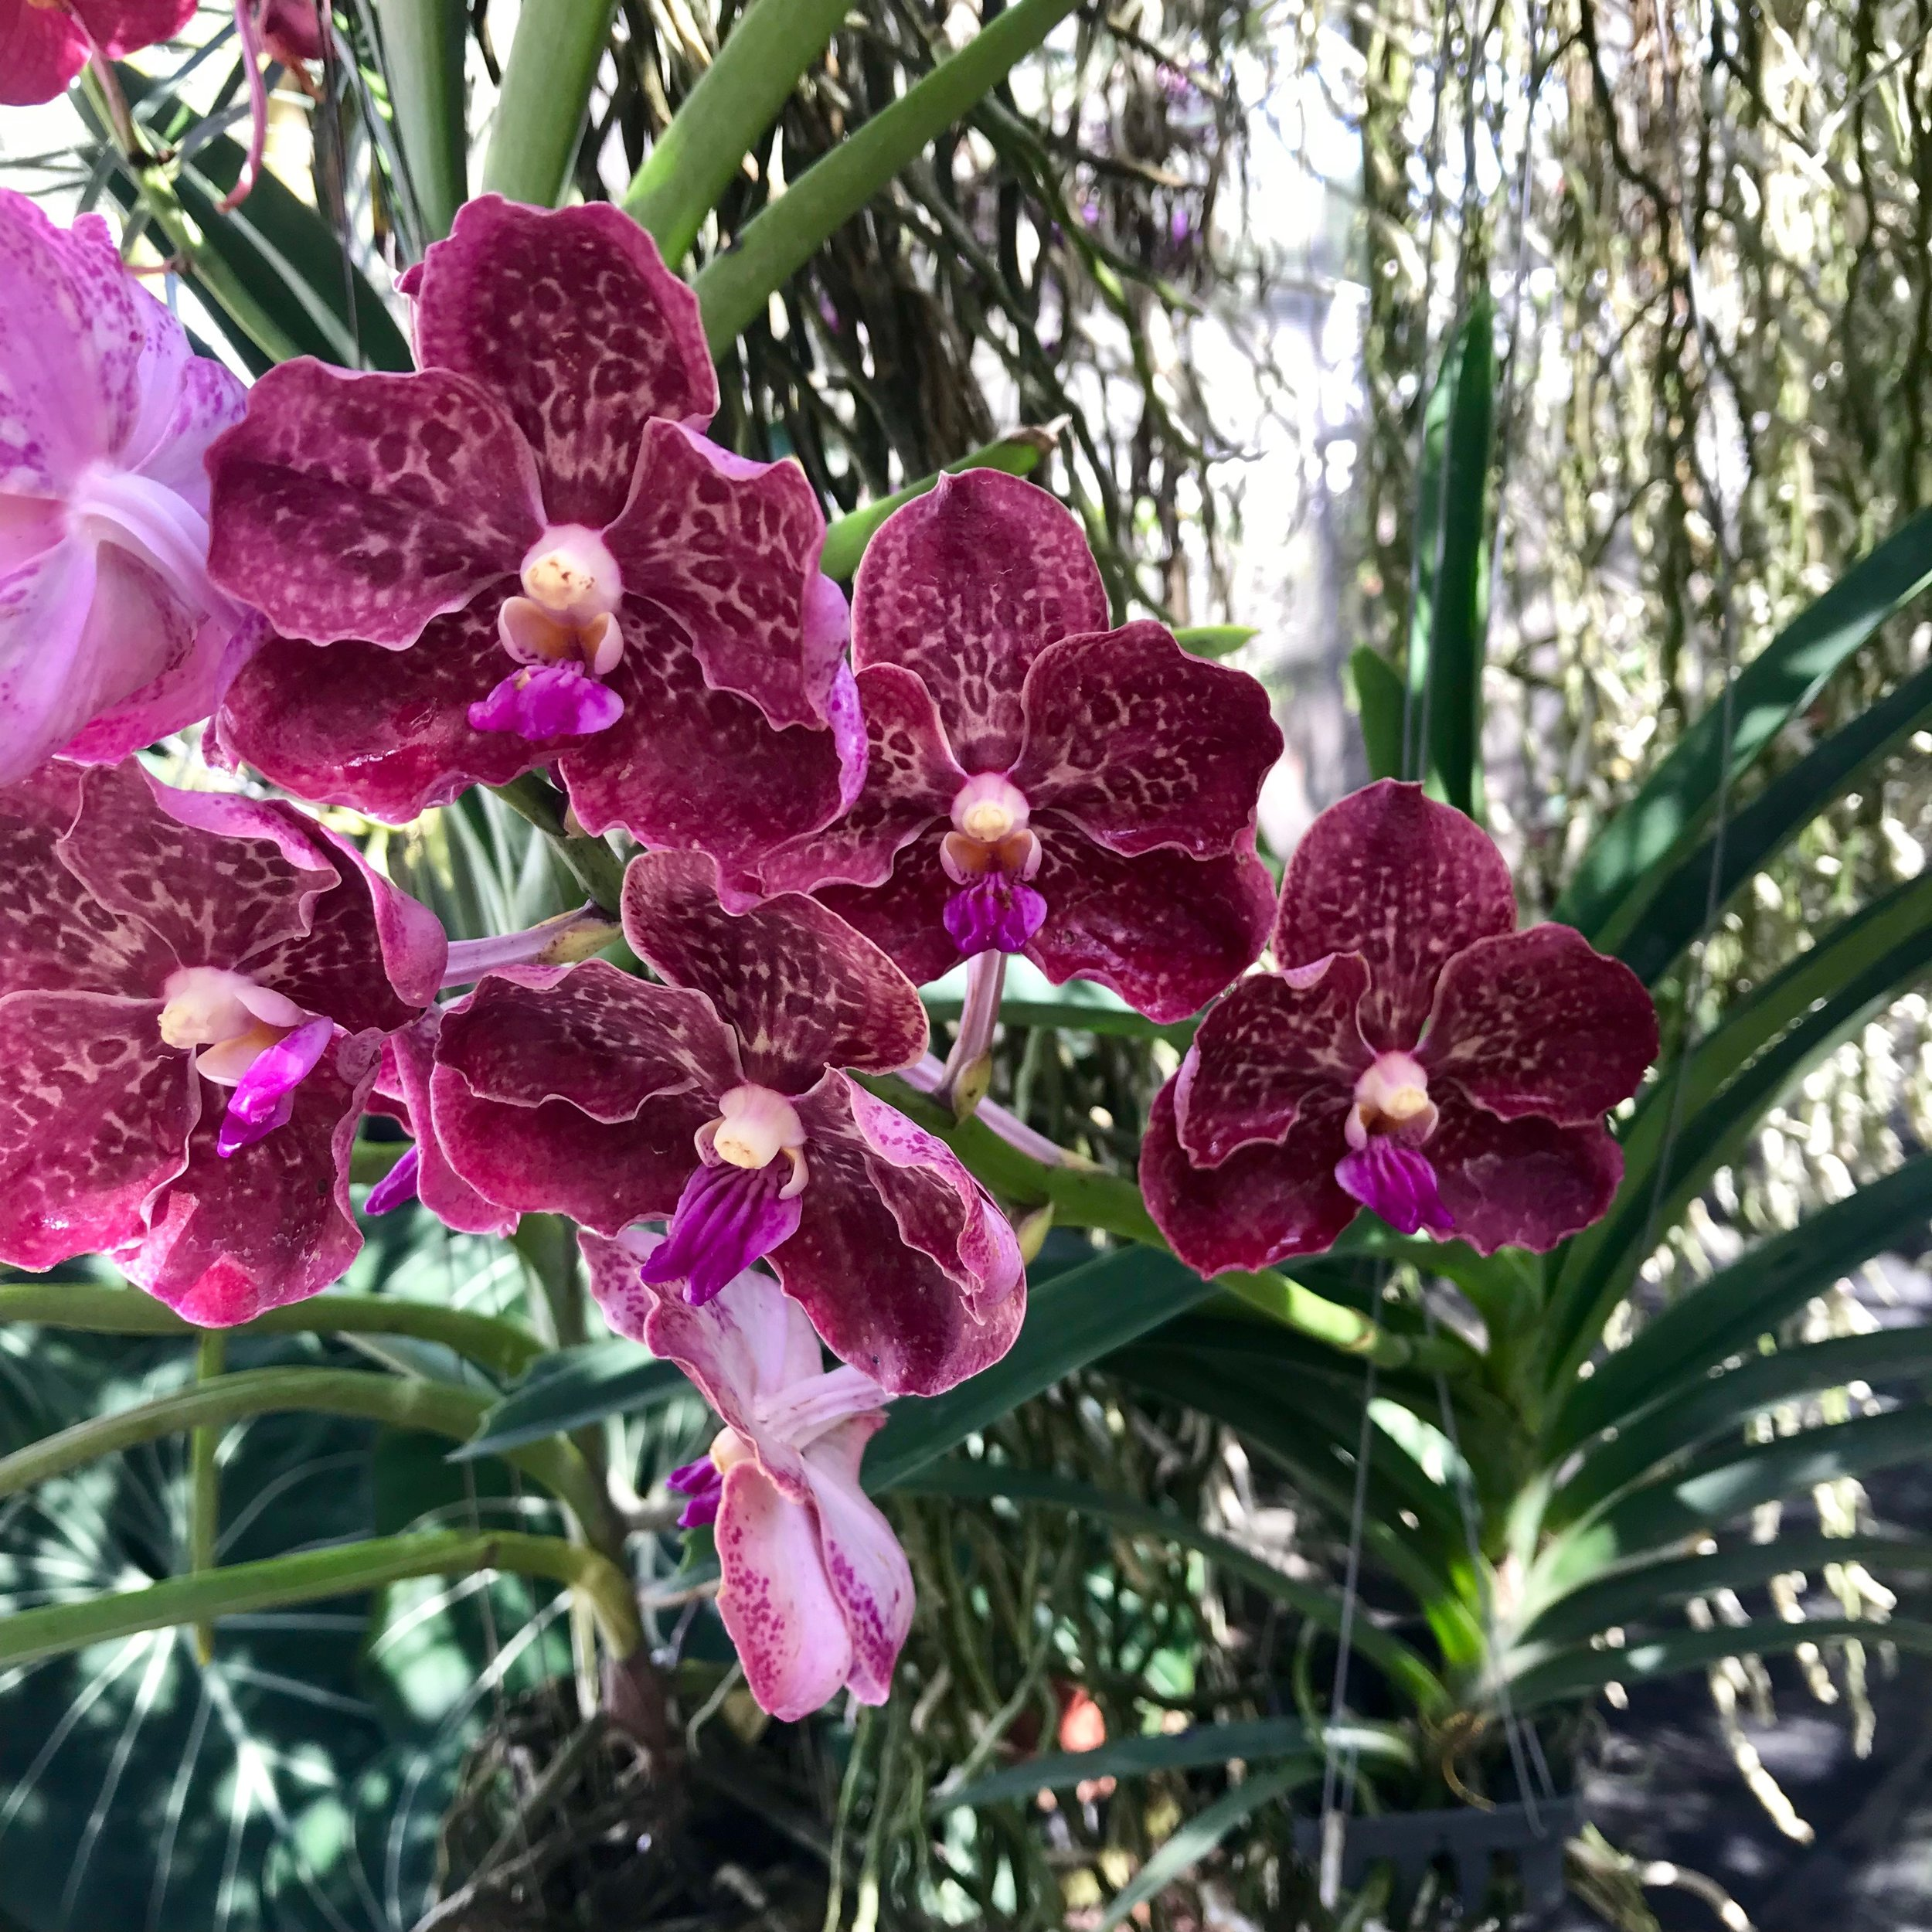 Papilionanda Corneels Cilliers (Papilionanda Mimi Palmer x Vanda Doctor Anek) Palmer Orchids